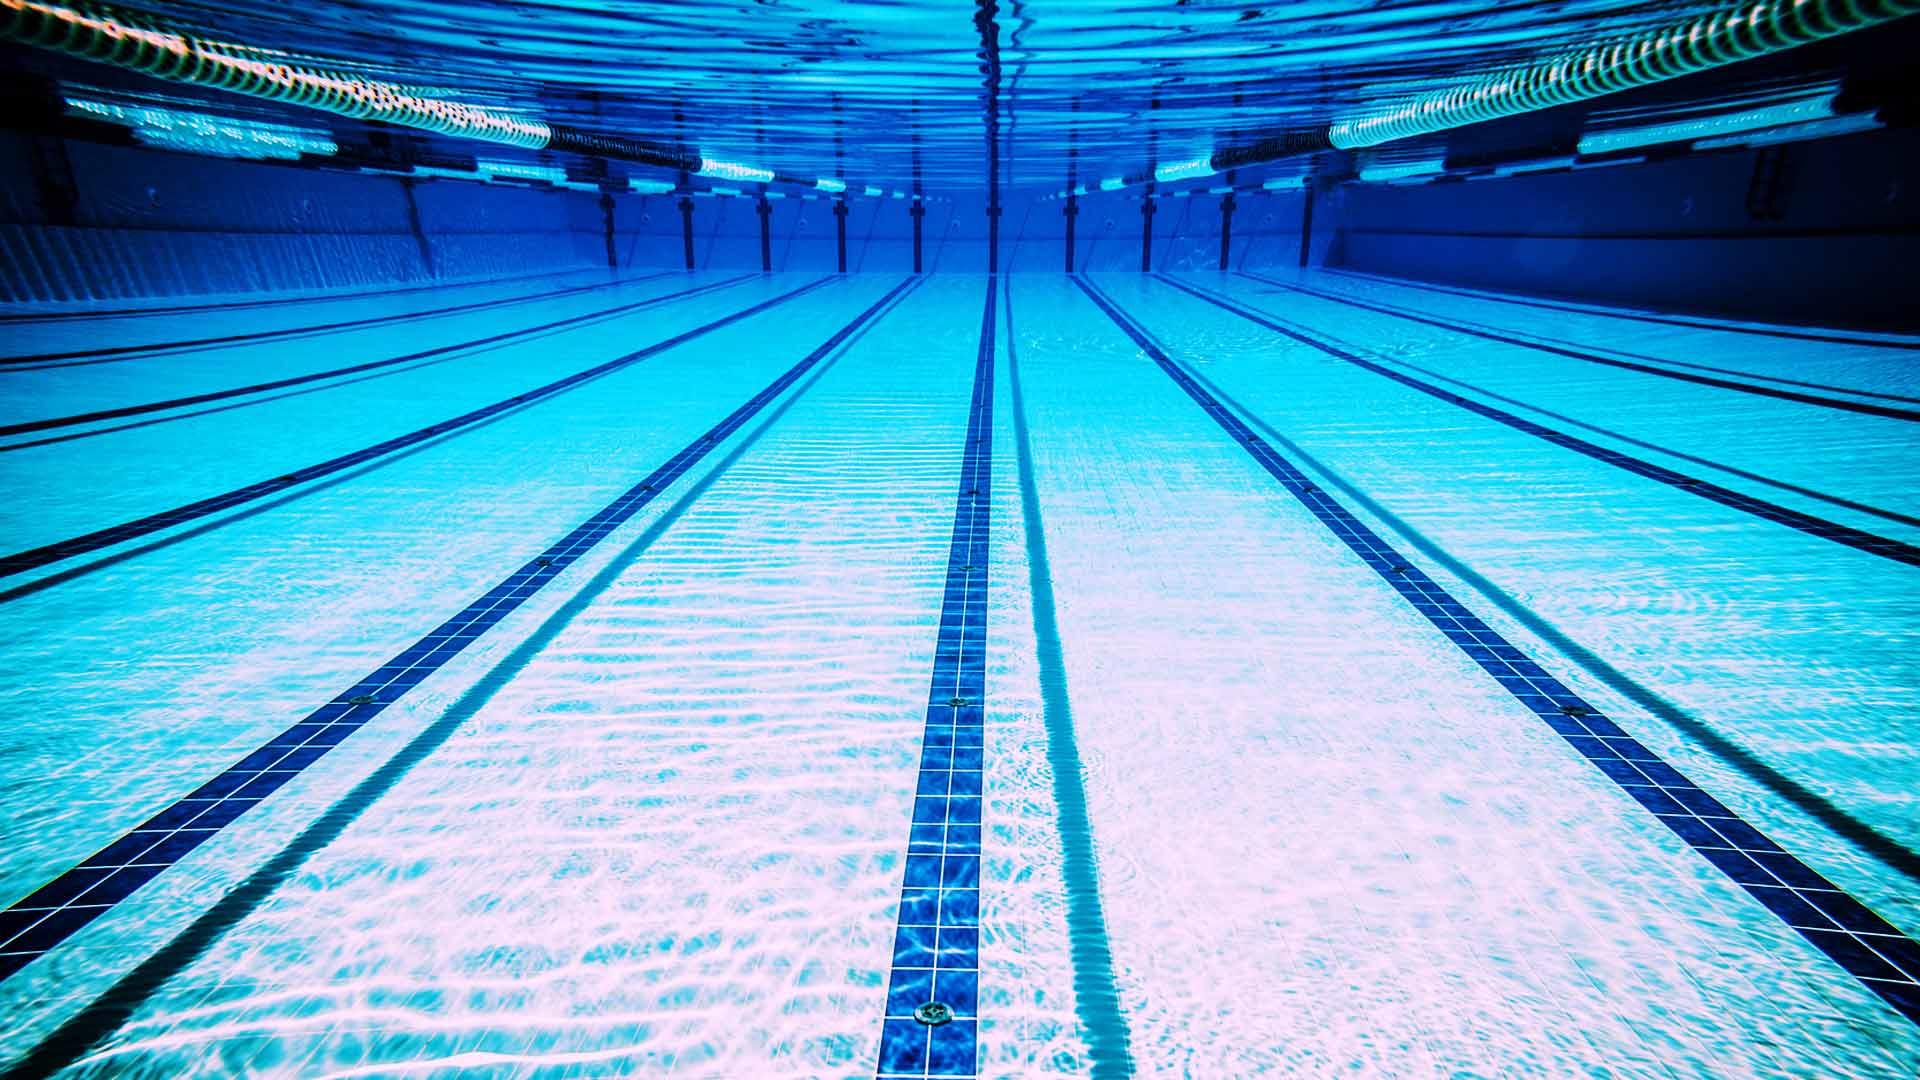 Votre centre aquatique de bolbec sera ouvert lundi 28 mars for Piscine gravenchon